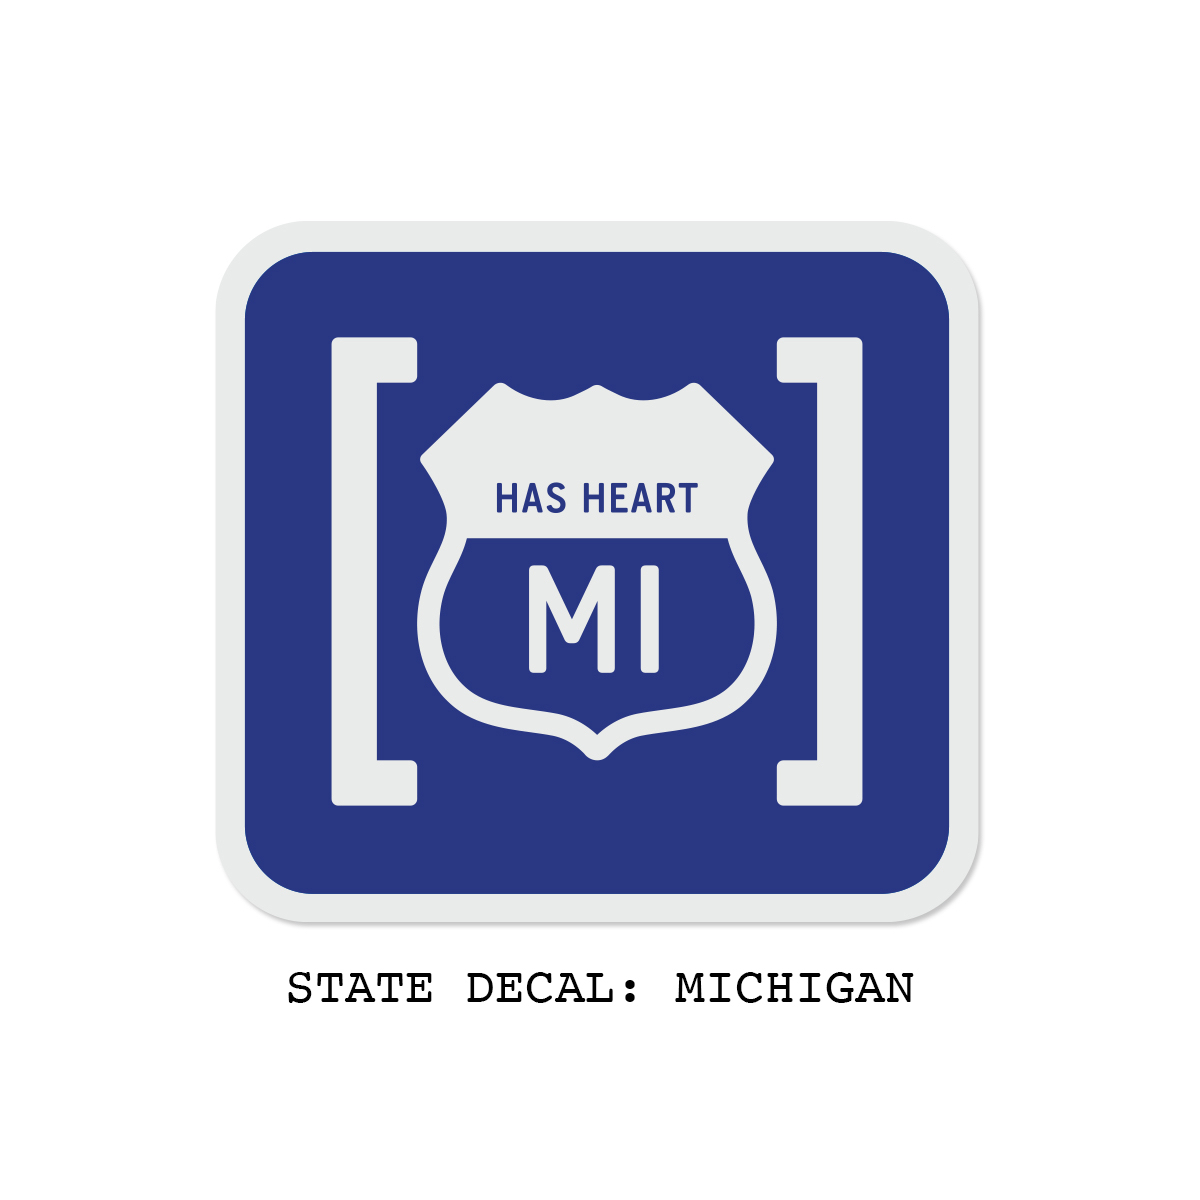 hasheart-statedecal-MI